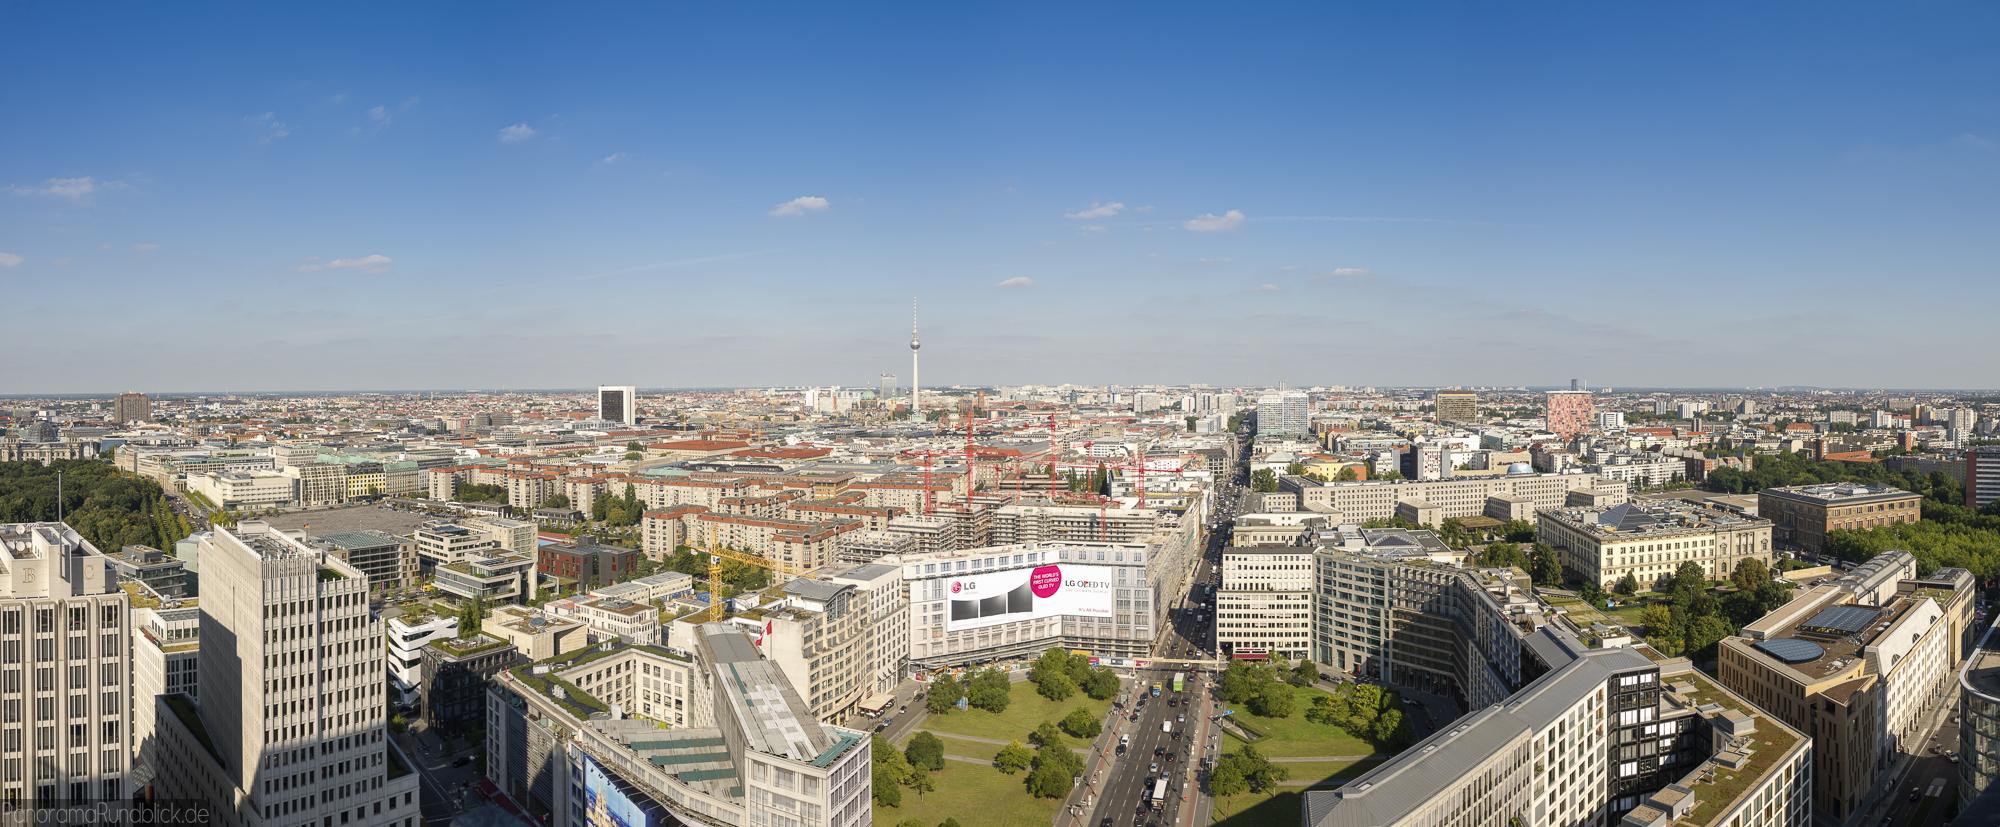 Panoramablick vom Kollhoff-Tower | Potsdamer Platz | Berlin